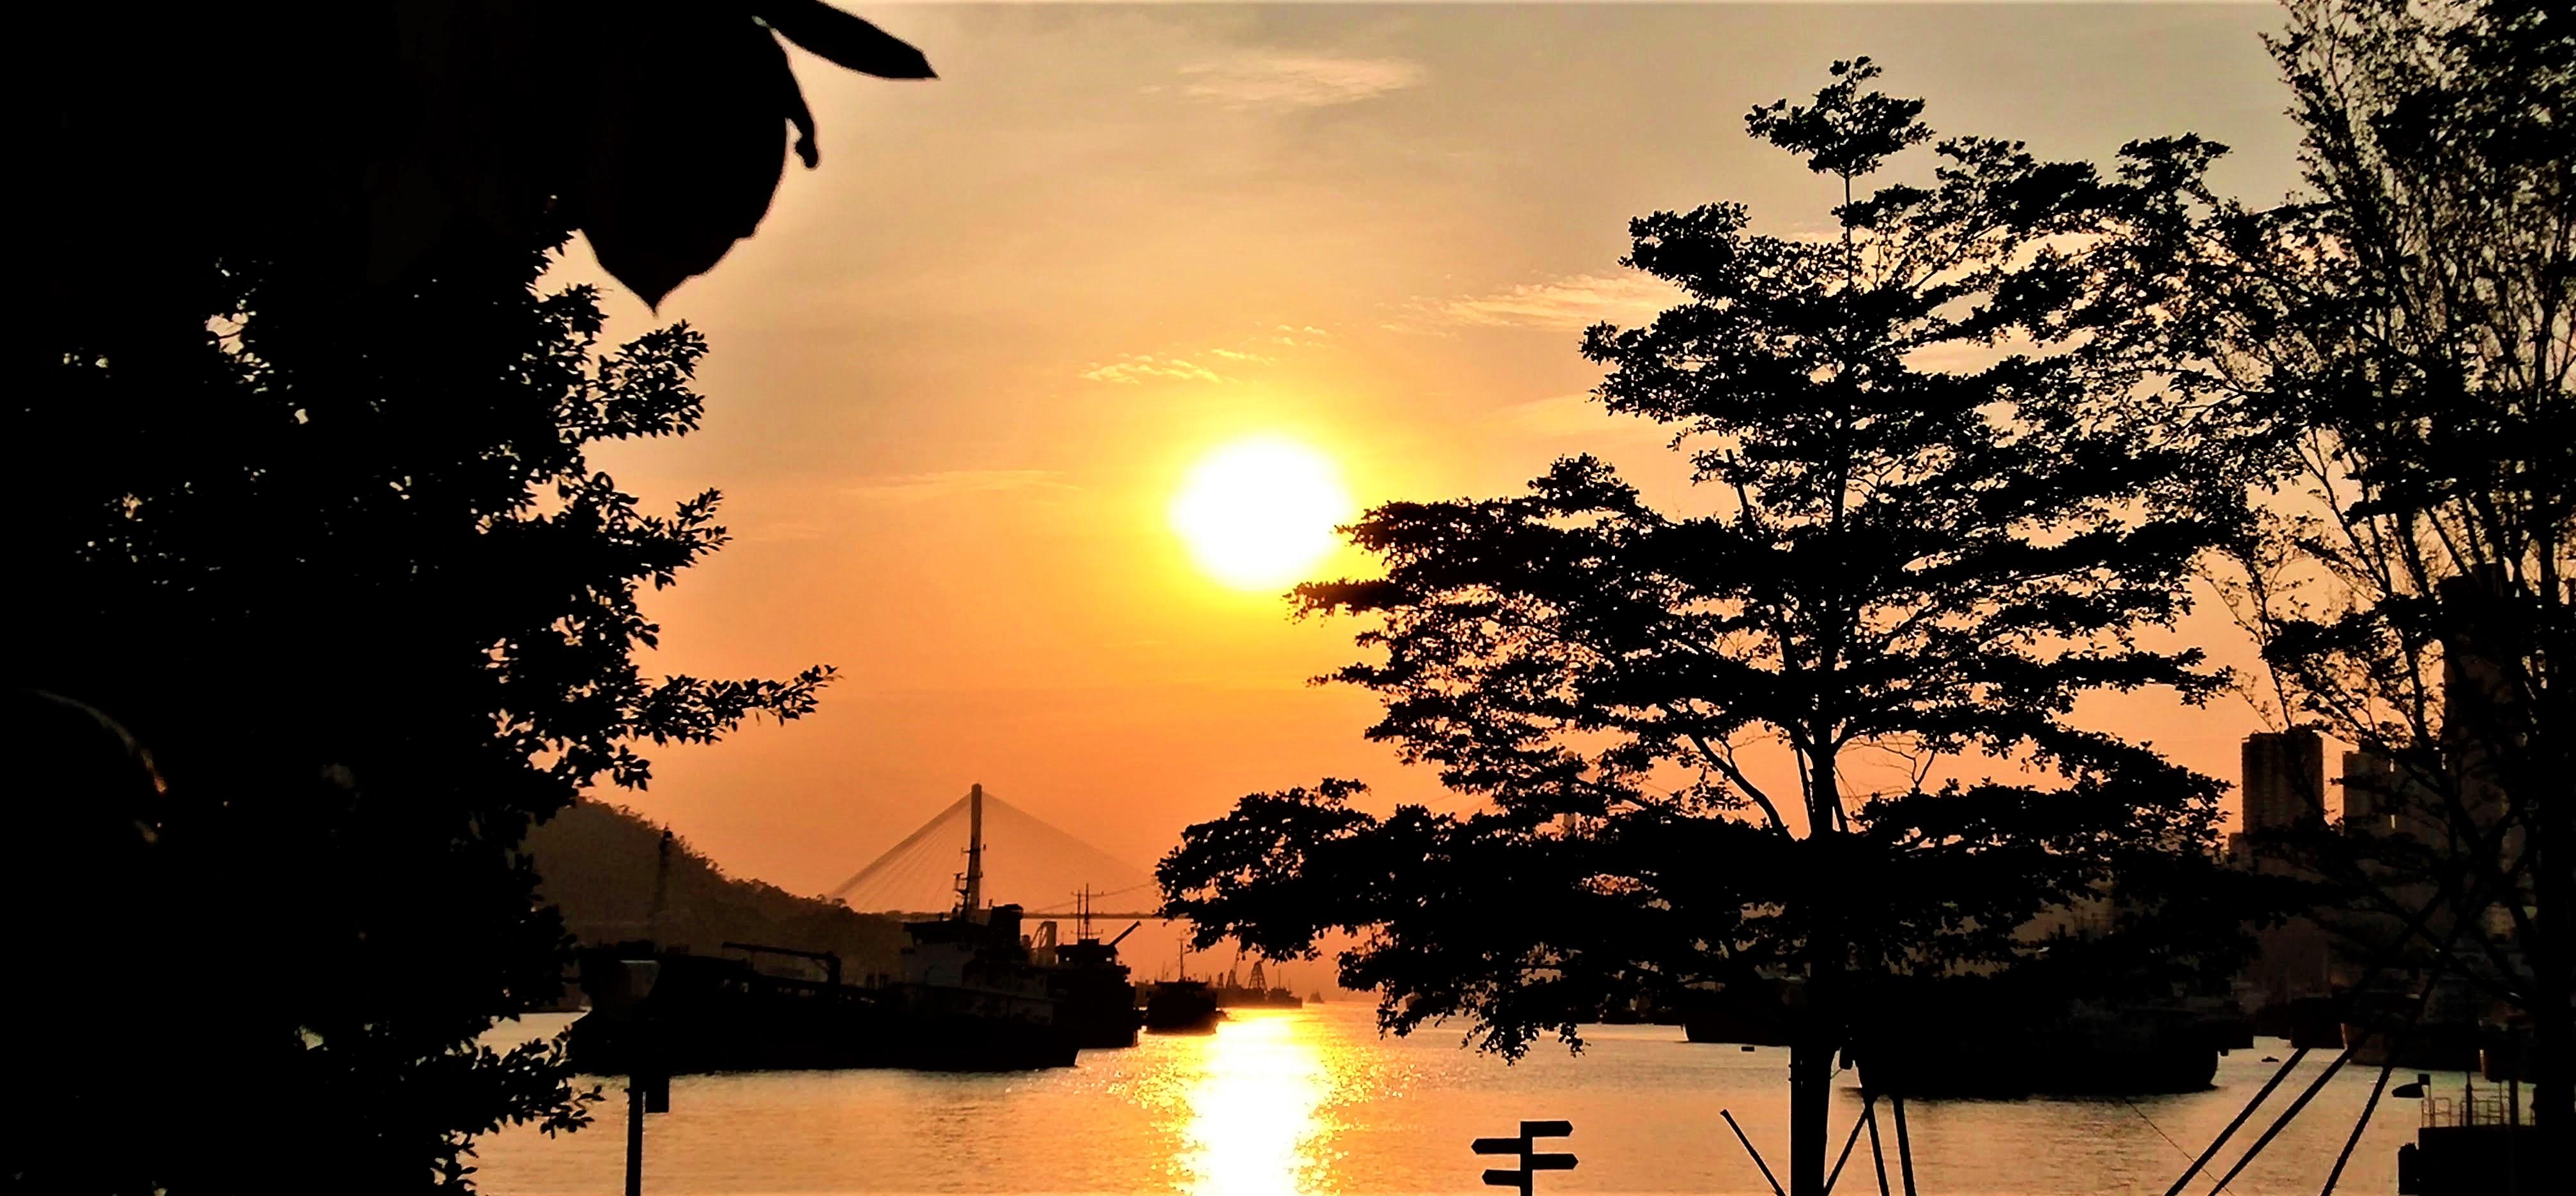 Great Ting Kau Bridge under the nice sunset